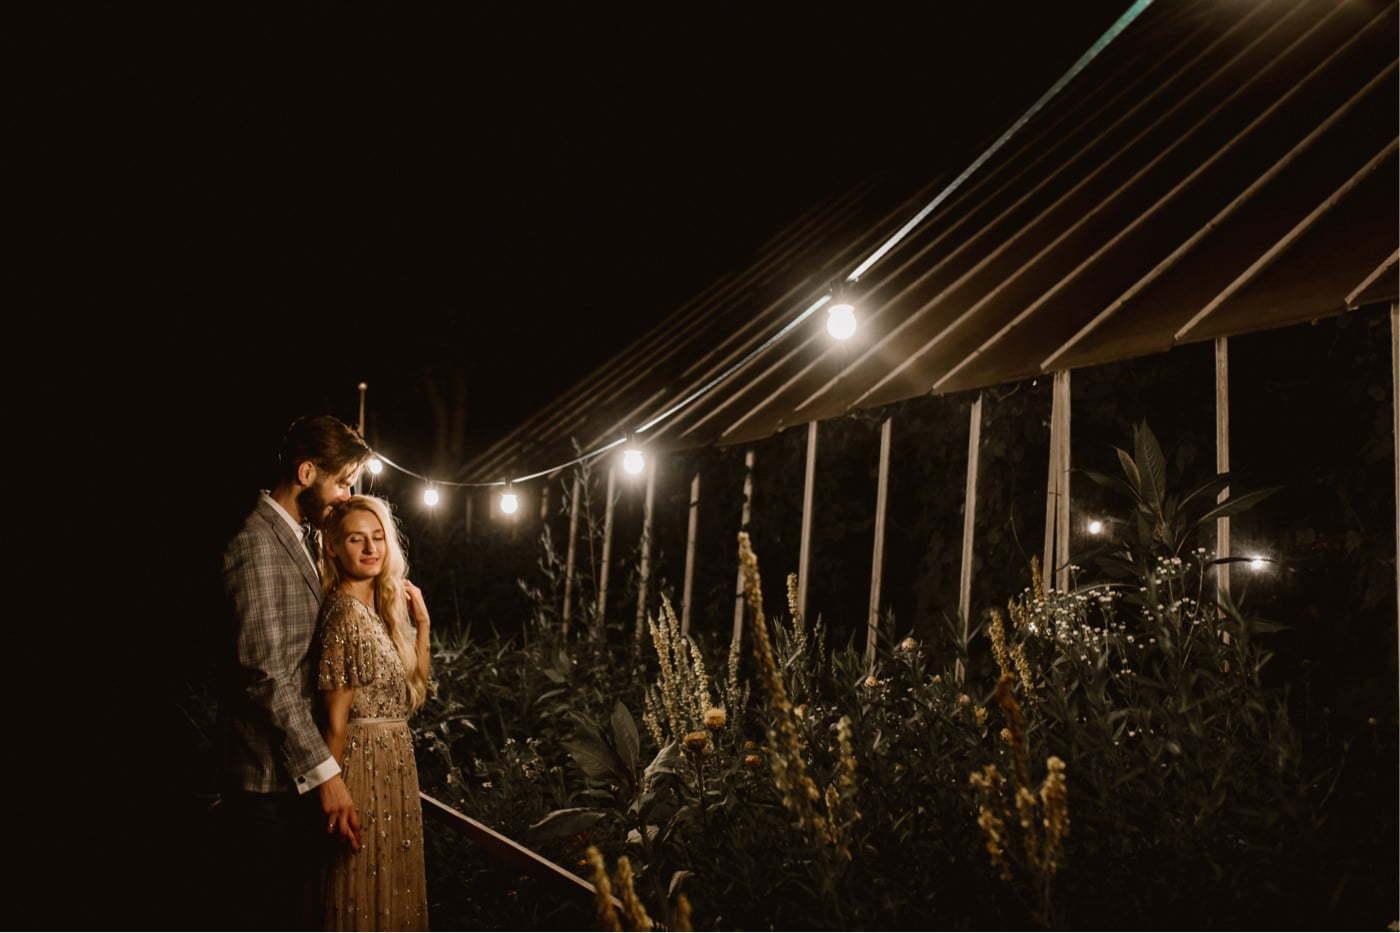 ewelina zieba rustykalne wesele stara oranzeria warszawa 091